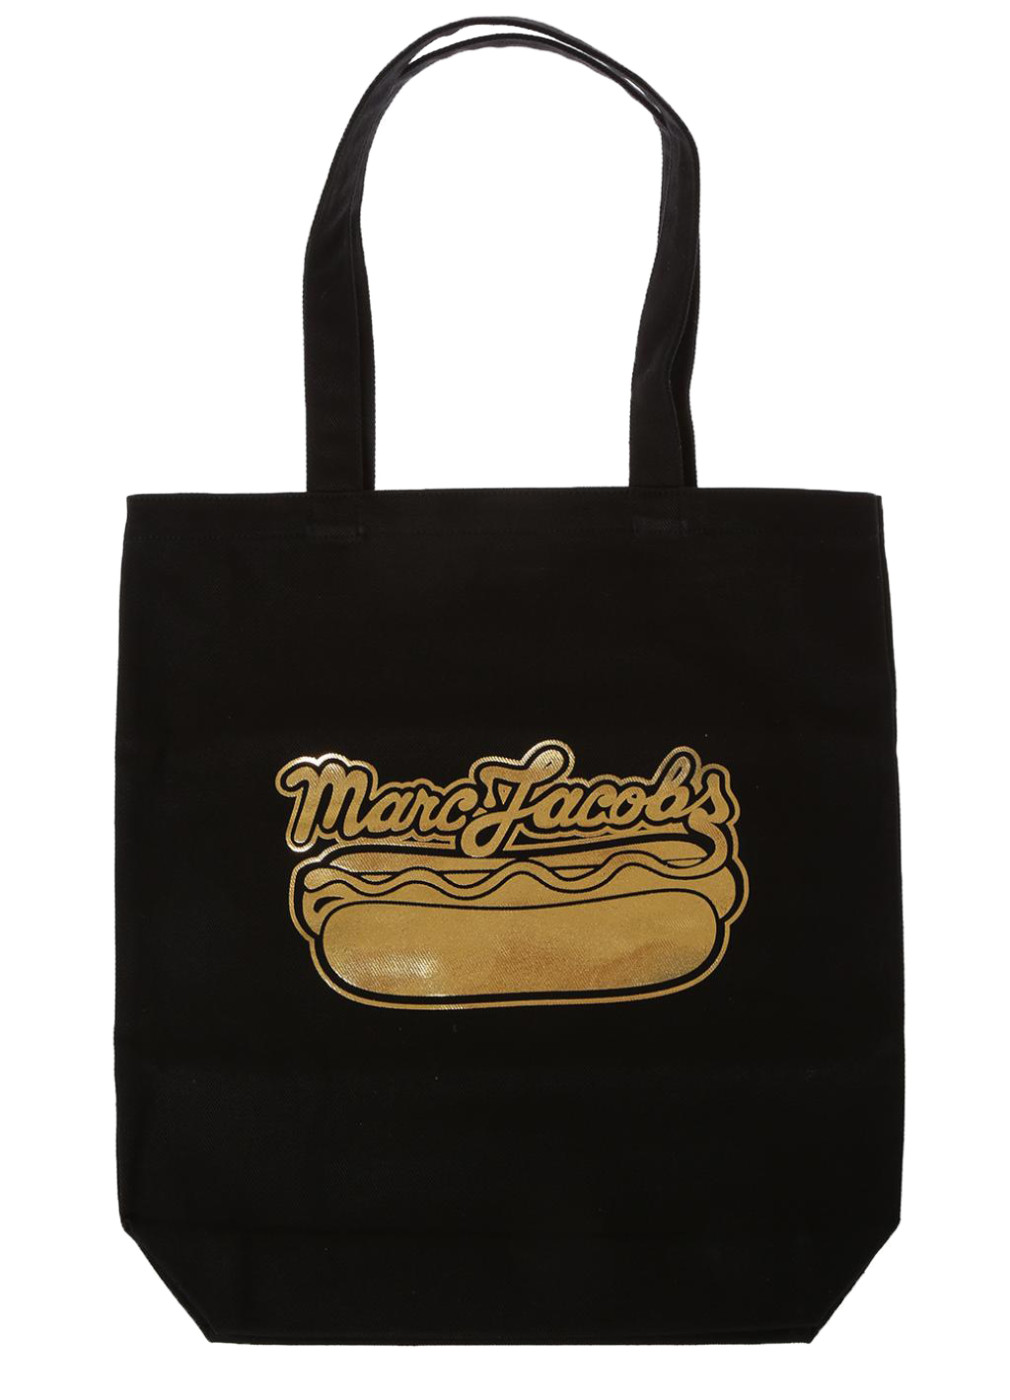 68a3cbe0d106 Marc Jacobs Black Cotton Hot Dog Print Handbag Tote Bag